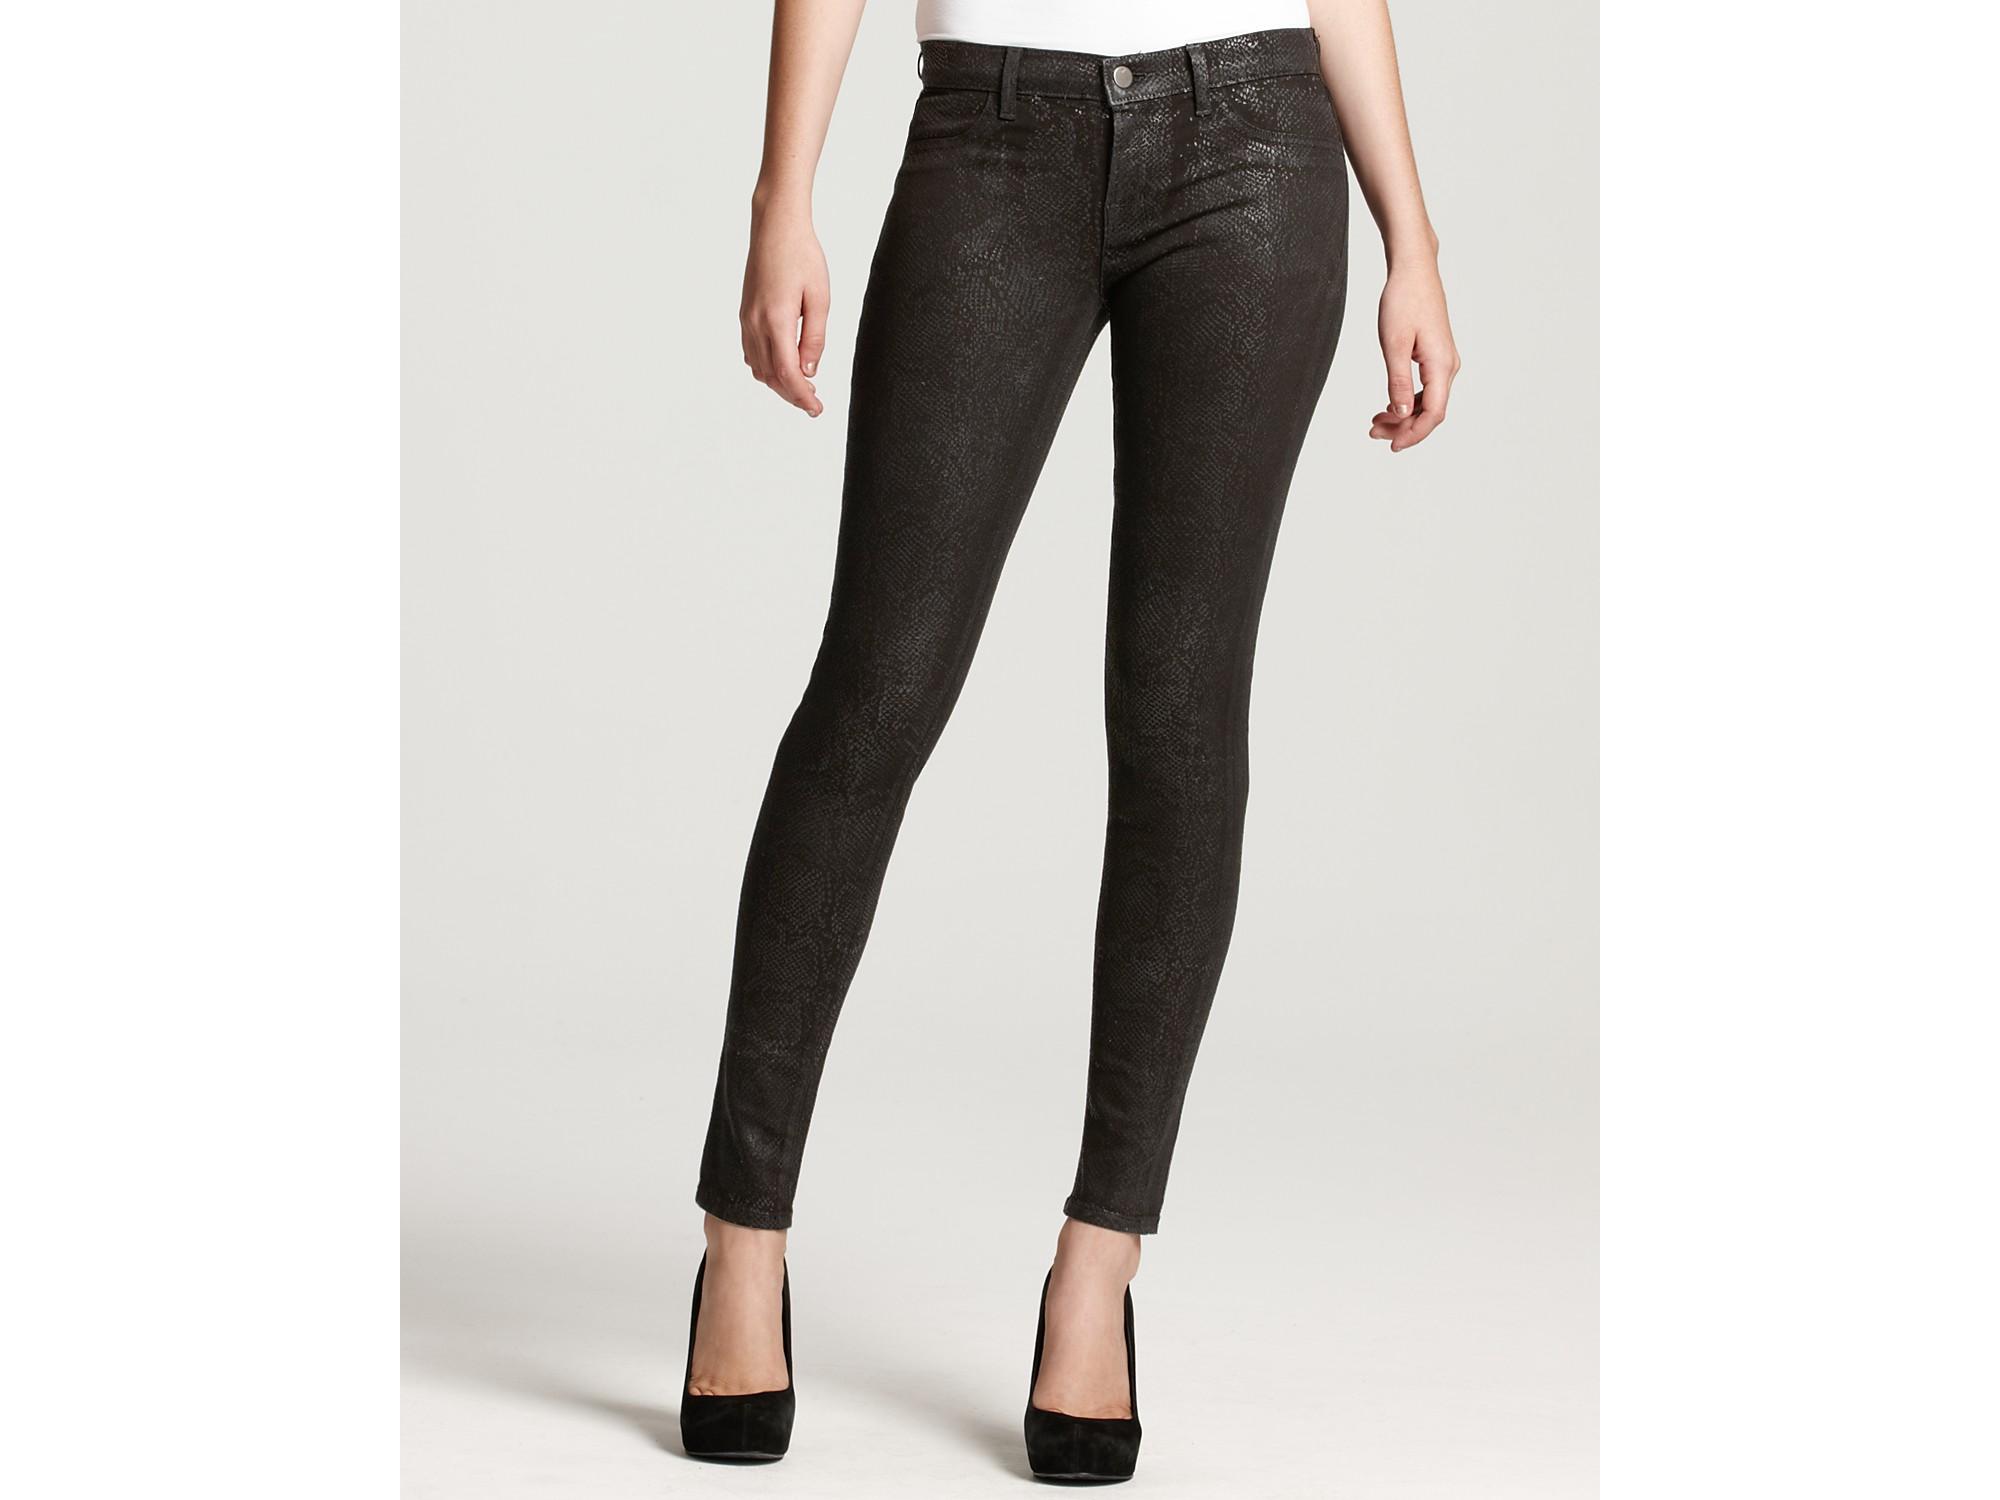 J brand 901 Matte Python Skinny Jeans in Black | Lyst